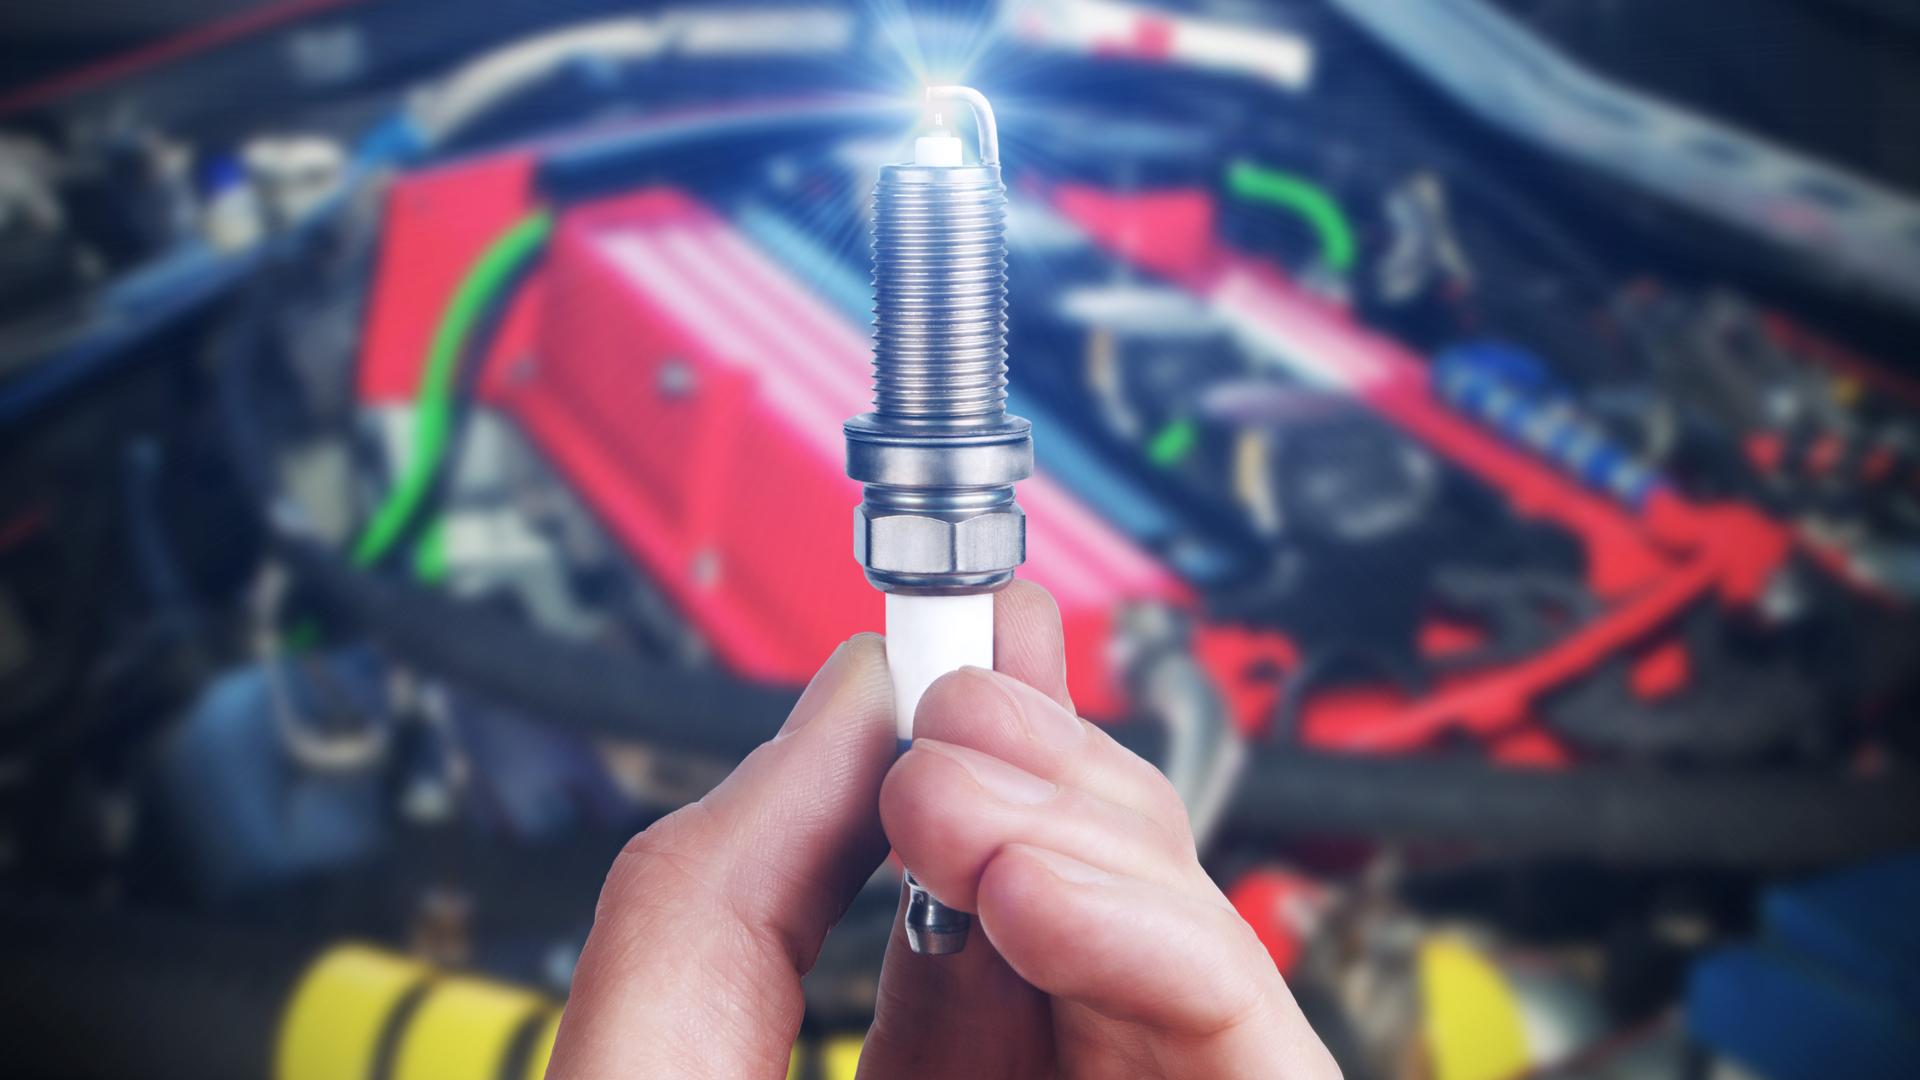 mecanico segurando vela carro consumo shutterstock 612251648